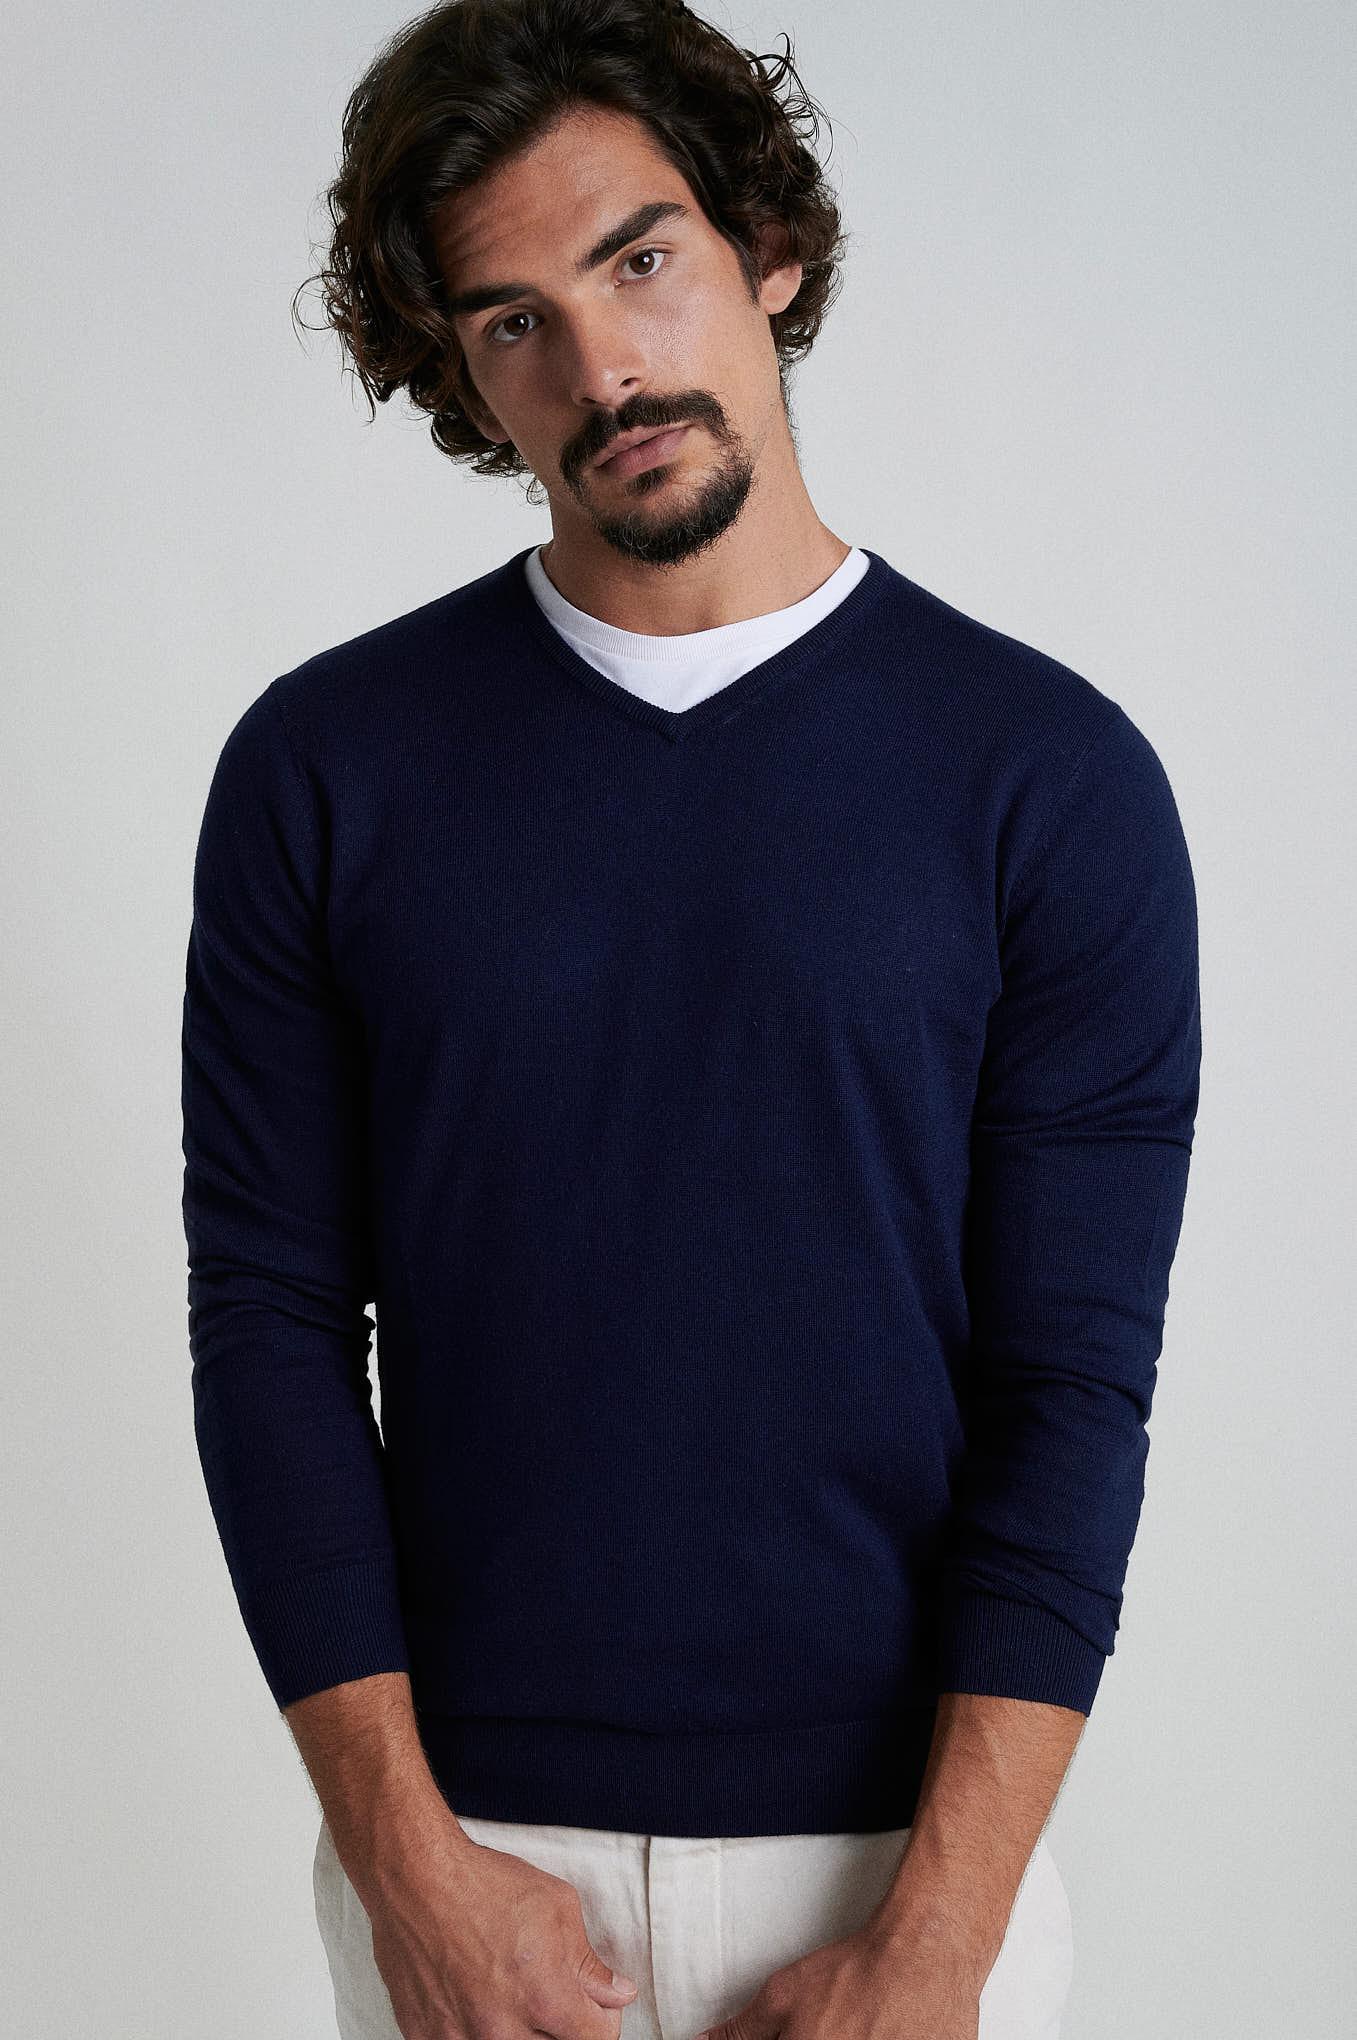 Malha Azul Escuro Casual Homem